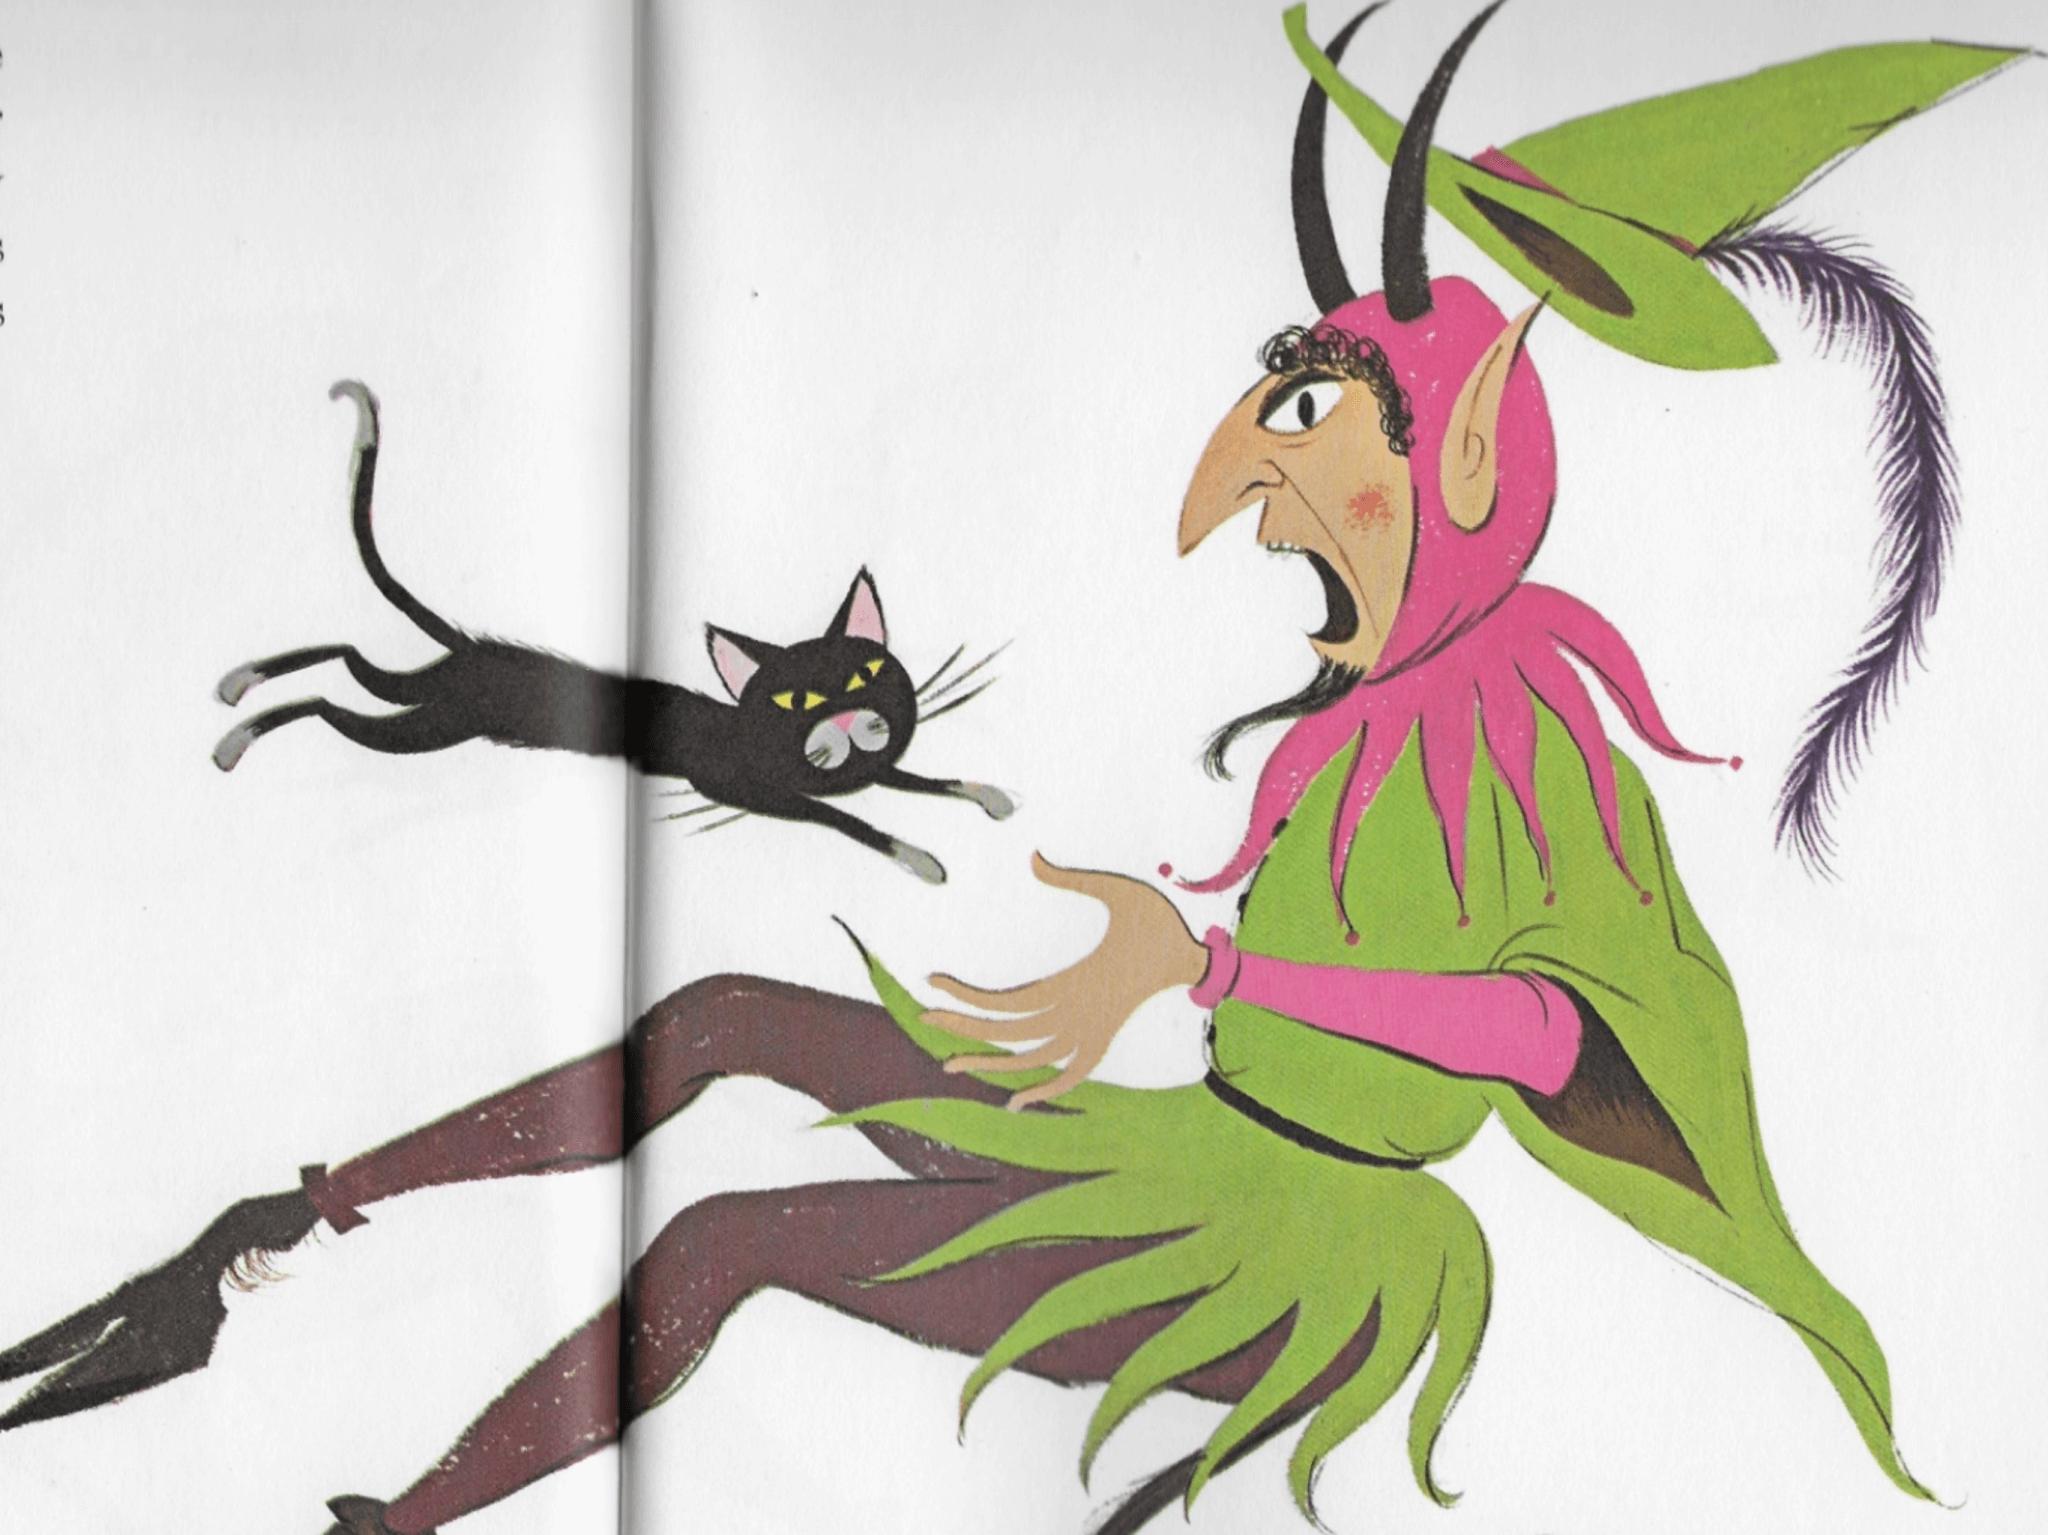 《貓與魔鬼》Richard Erdoes畫